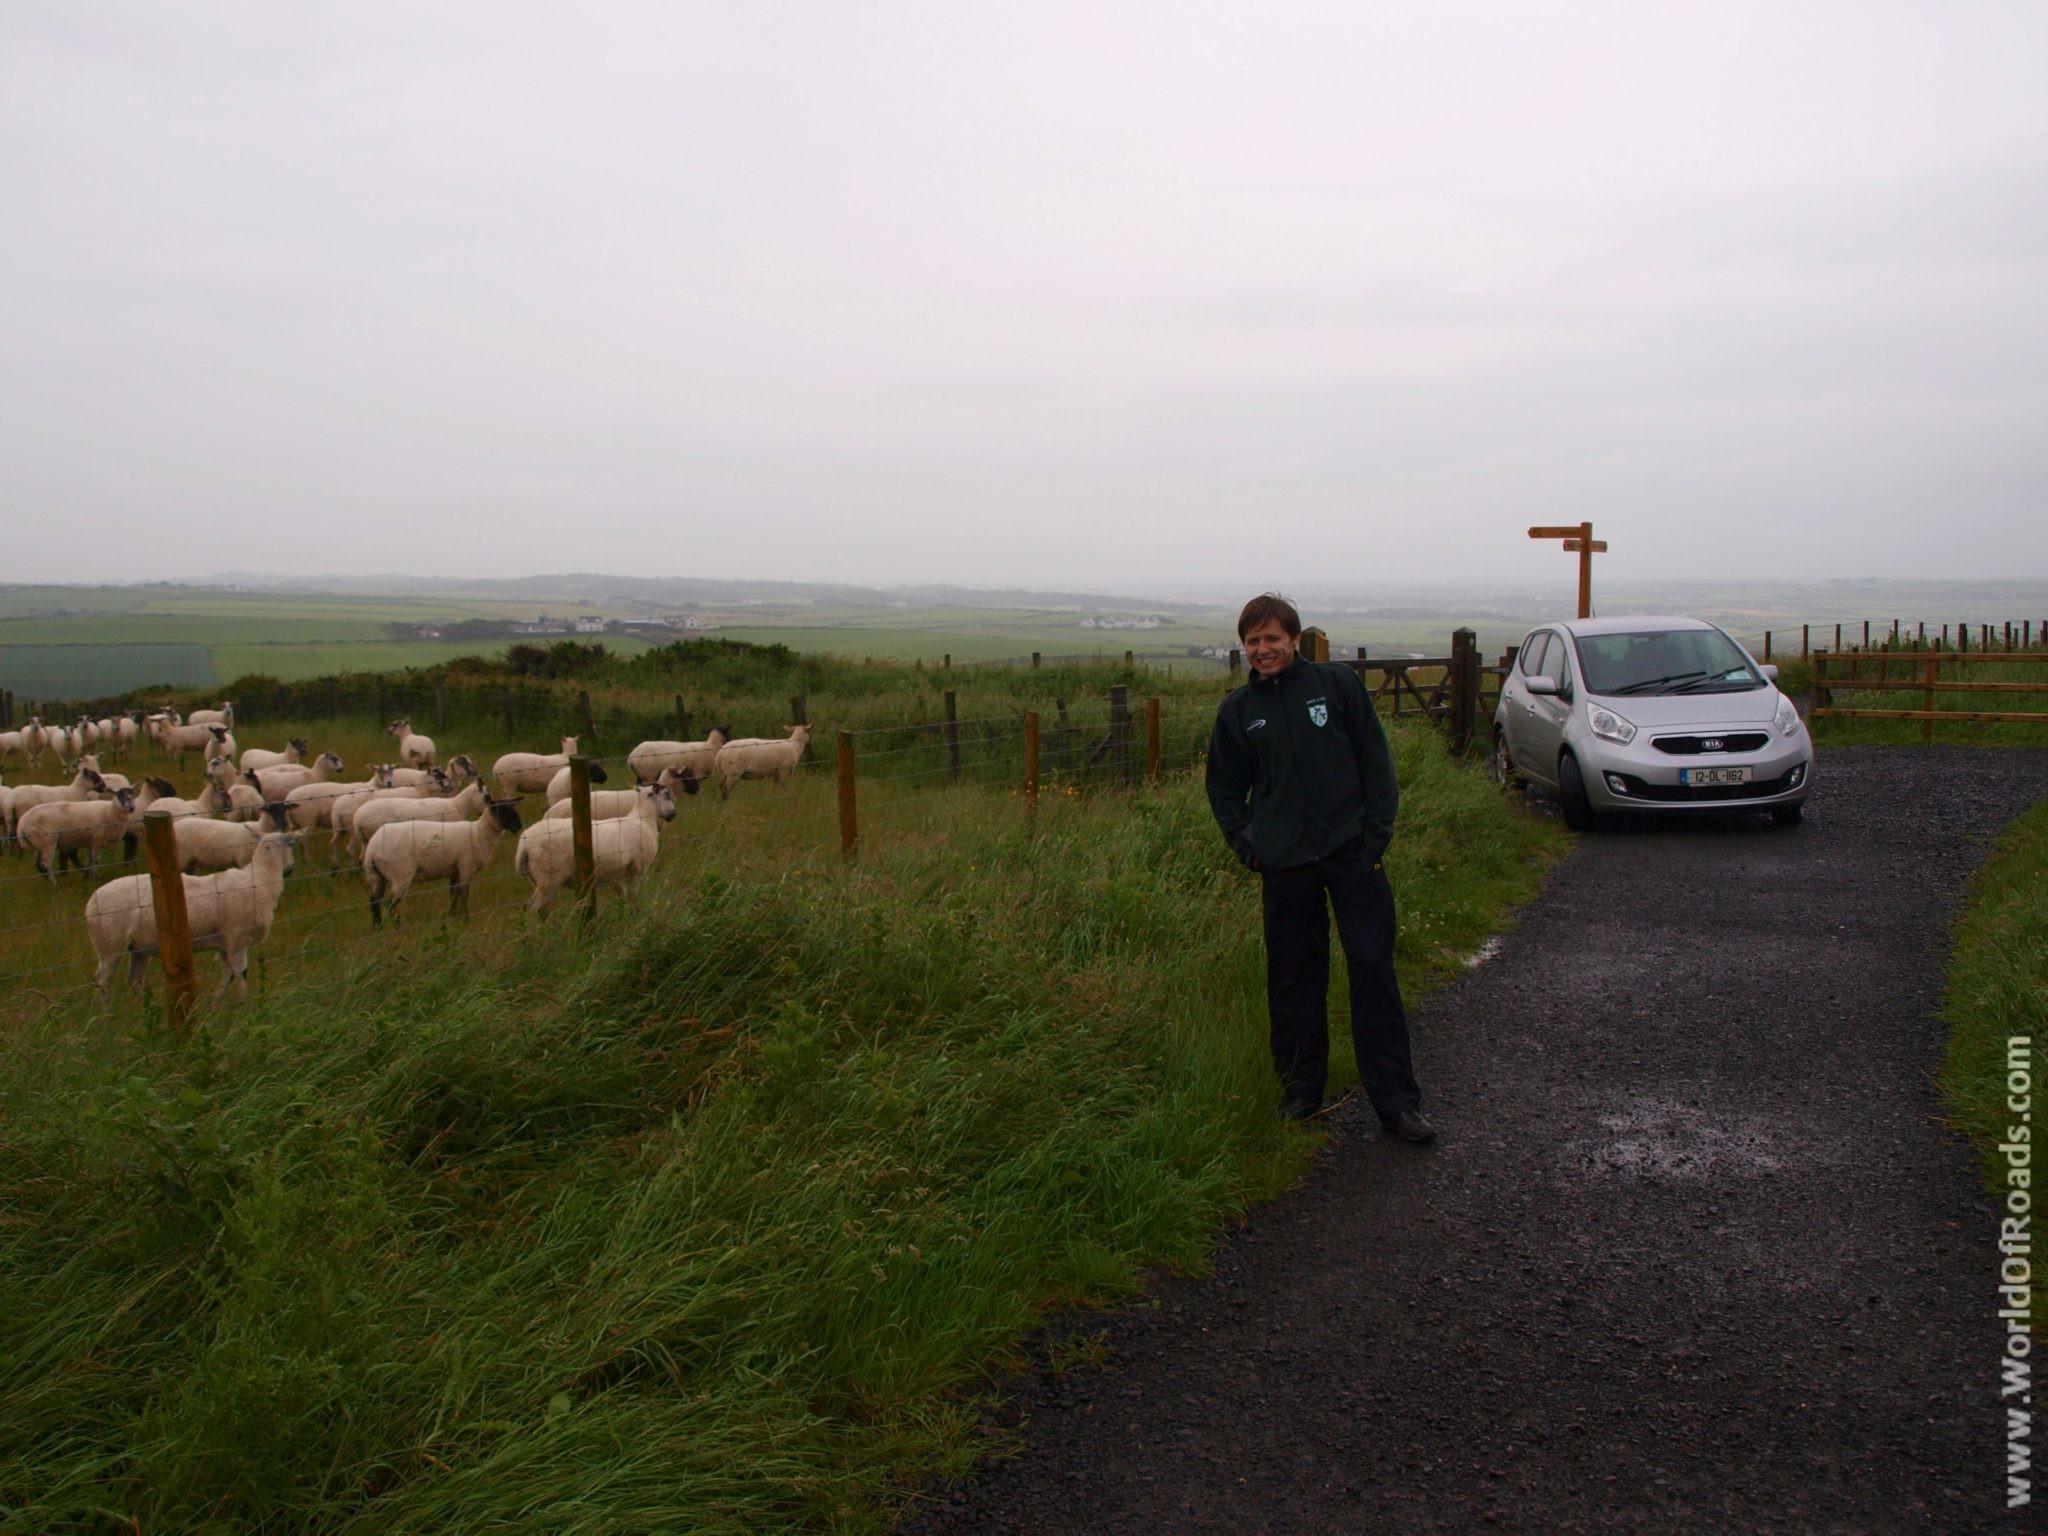 Приближаемся к Тропе Гиганта (Giant's Causeway). Северная Ирландия.